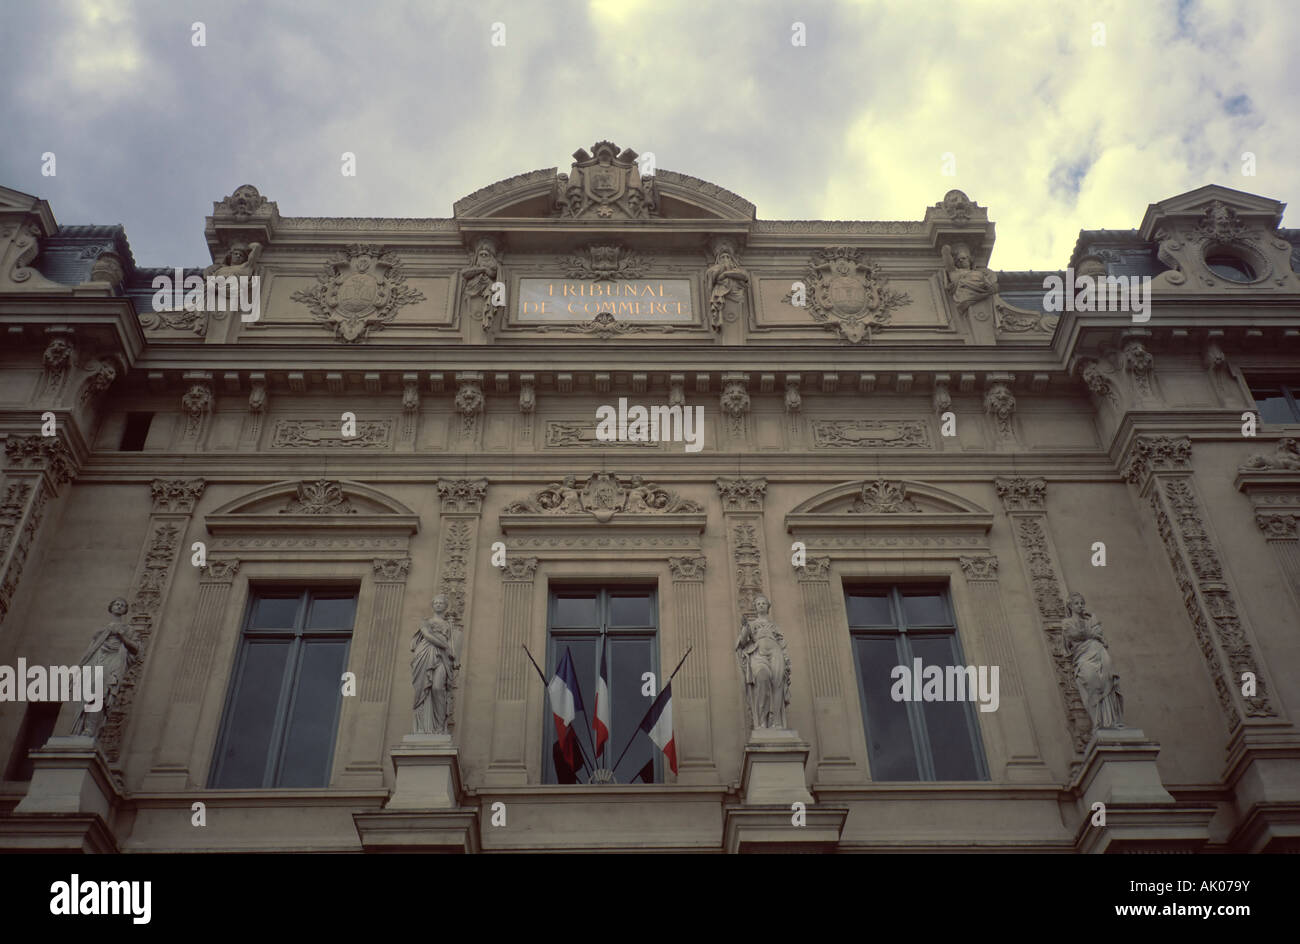 Facade of the Tribunal de Commerce in Paris - Stock Image